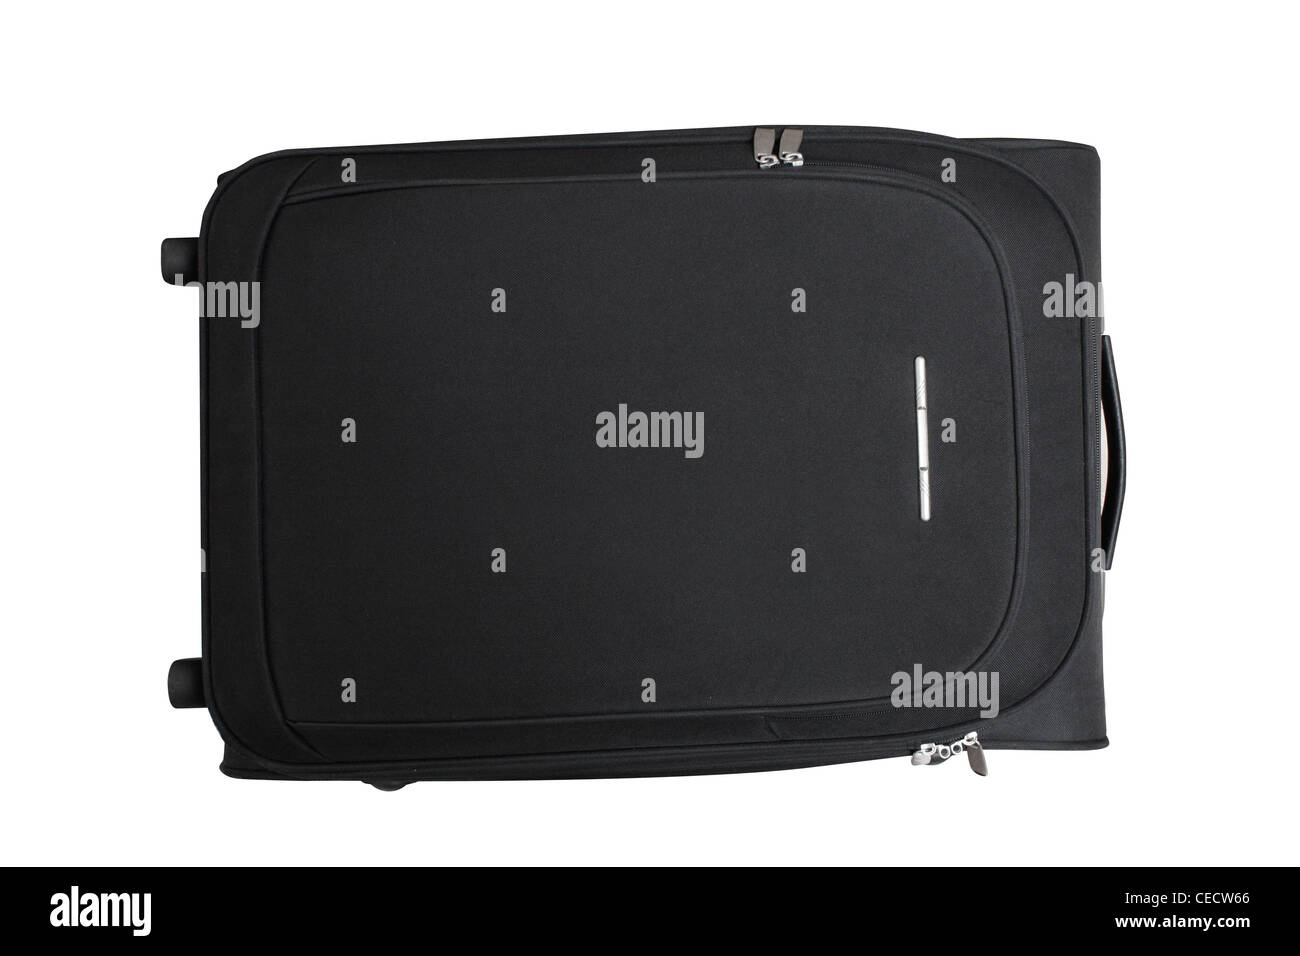 Black suitcase - Stock Image